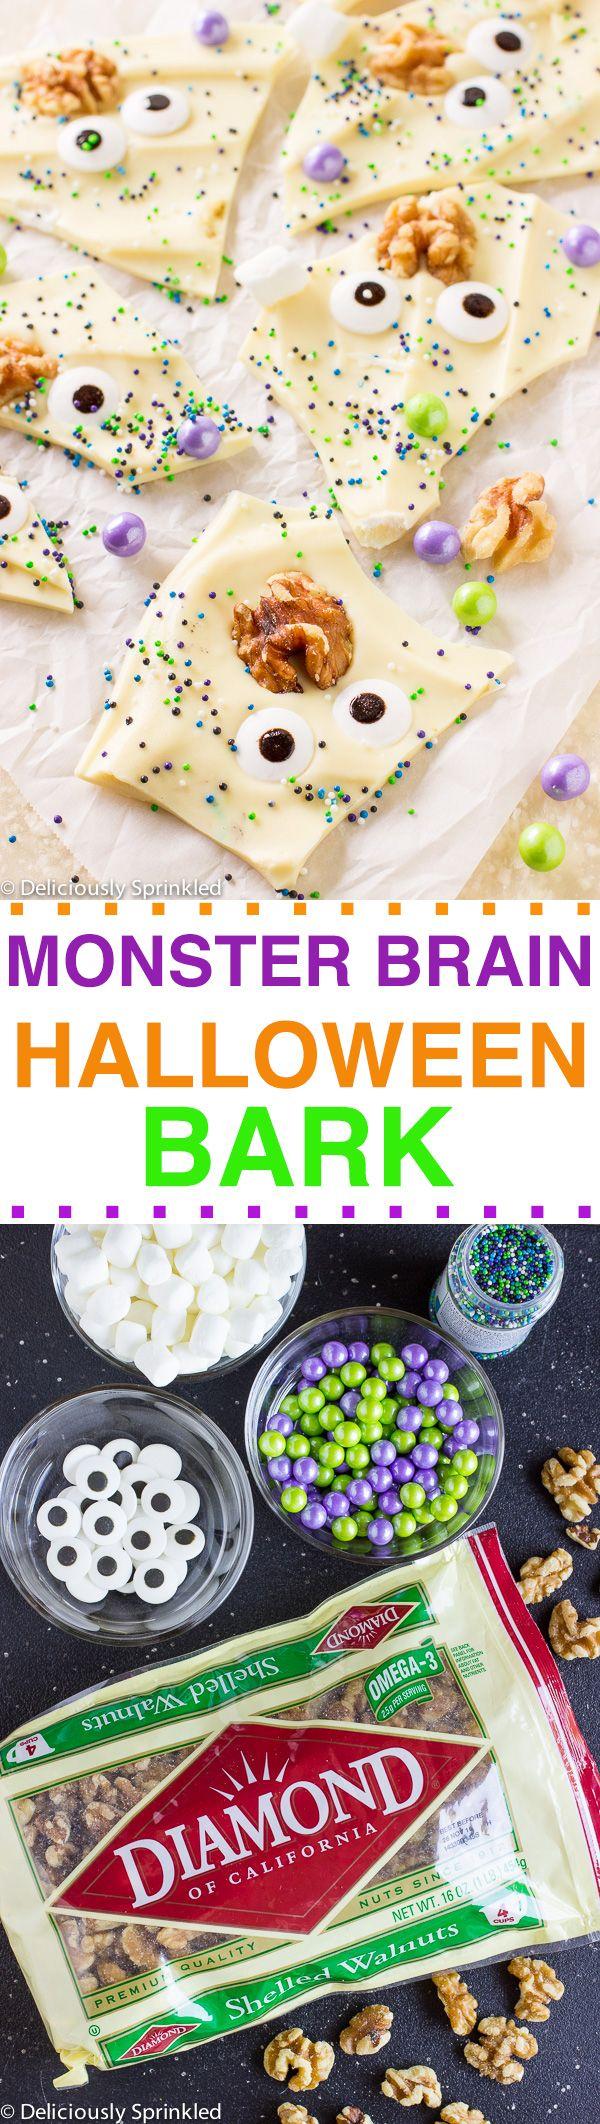 Monster Brain Halloween Bark- a super fun and easy Halloween party recipe!